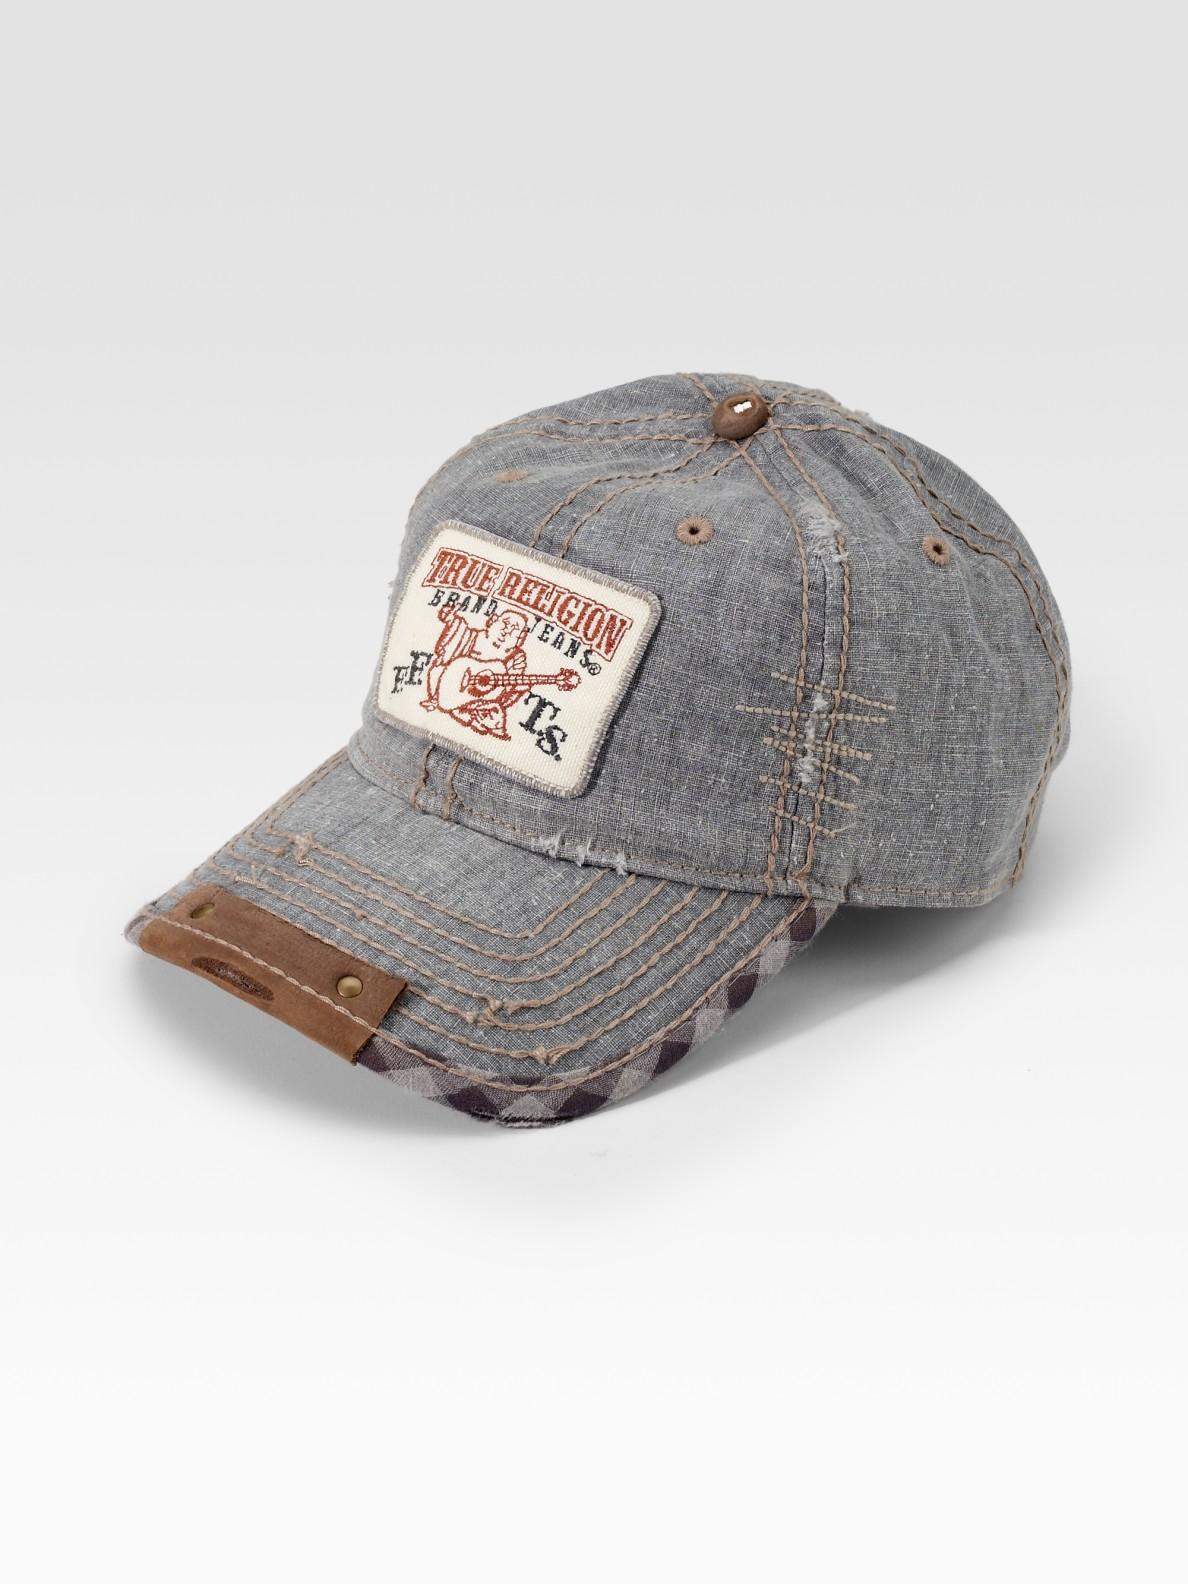 lyst true religion linen ball cap in brown for men. Black Bedroom Furniture Sets. Home Design Ideas